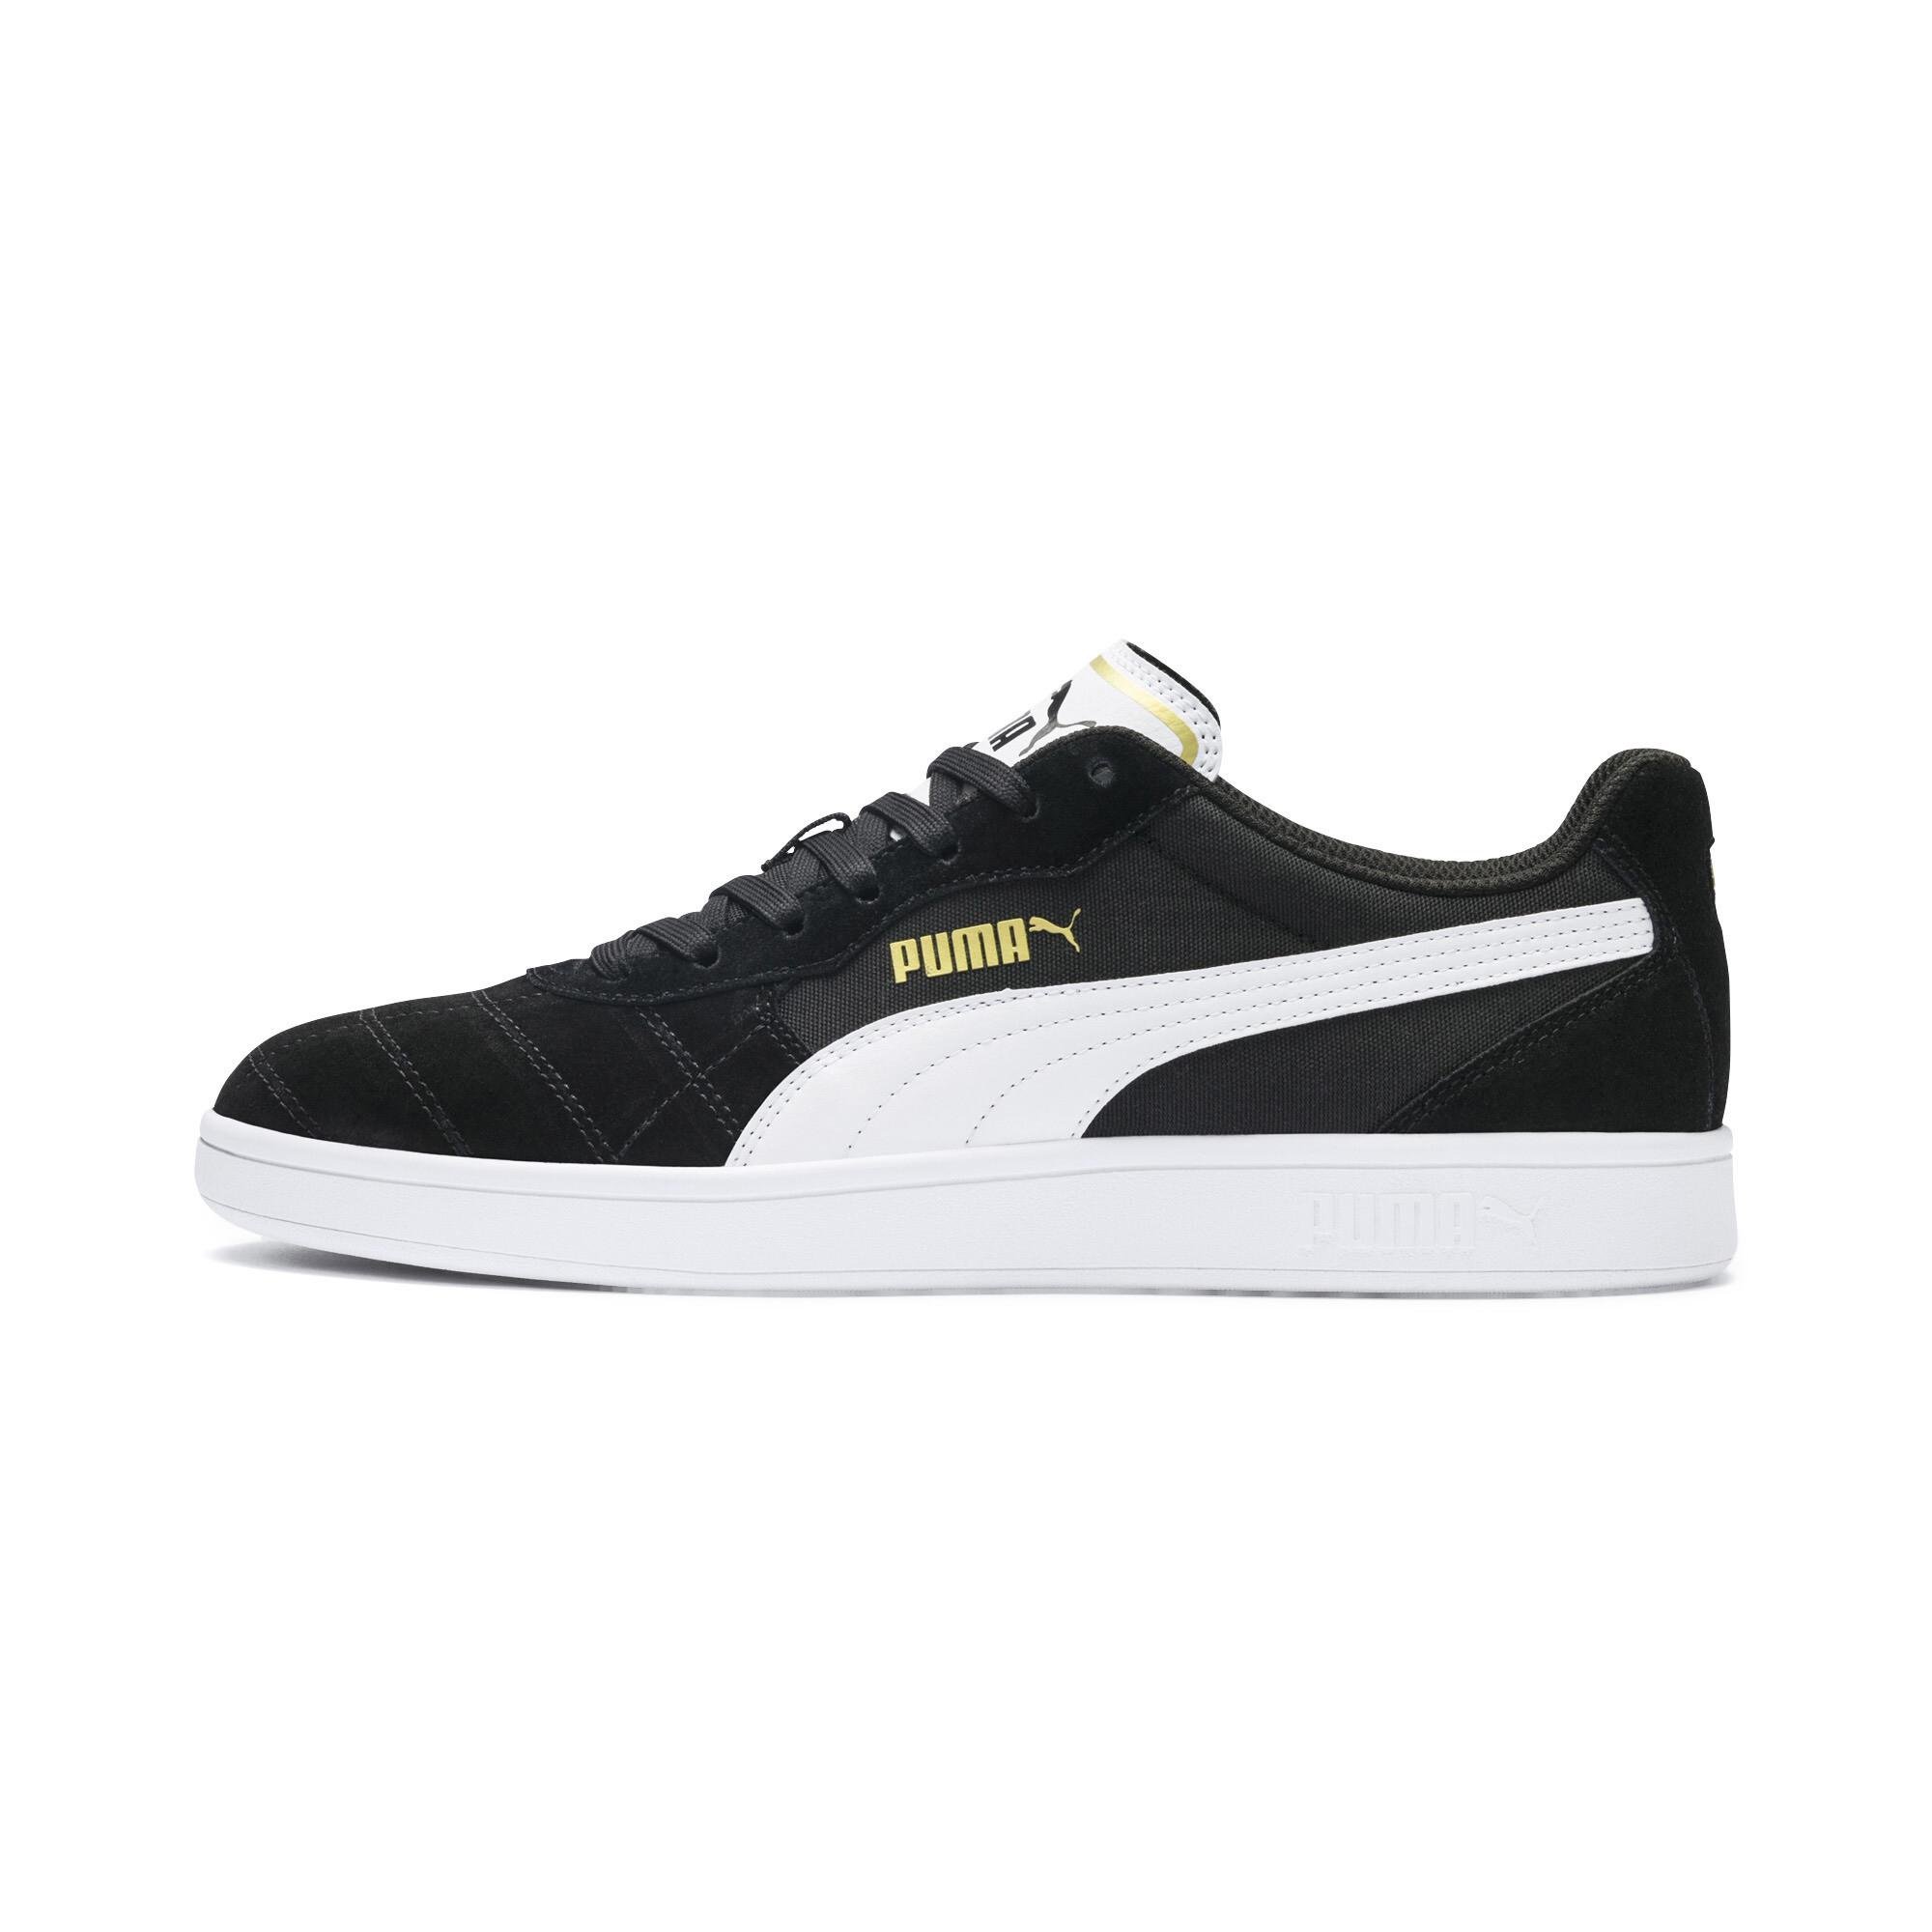 thumbnail 14 - PUMA Men's Astro Kick Sneakers